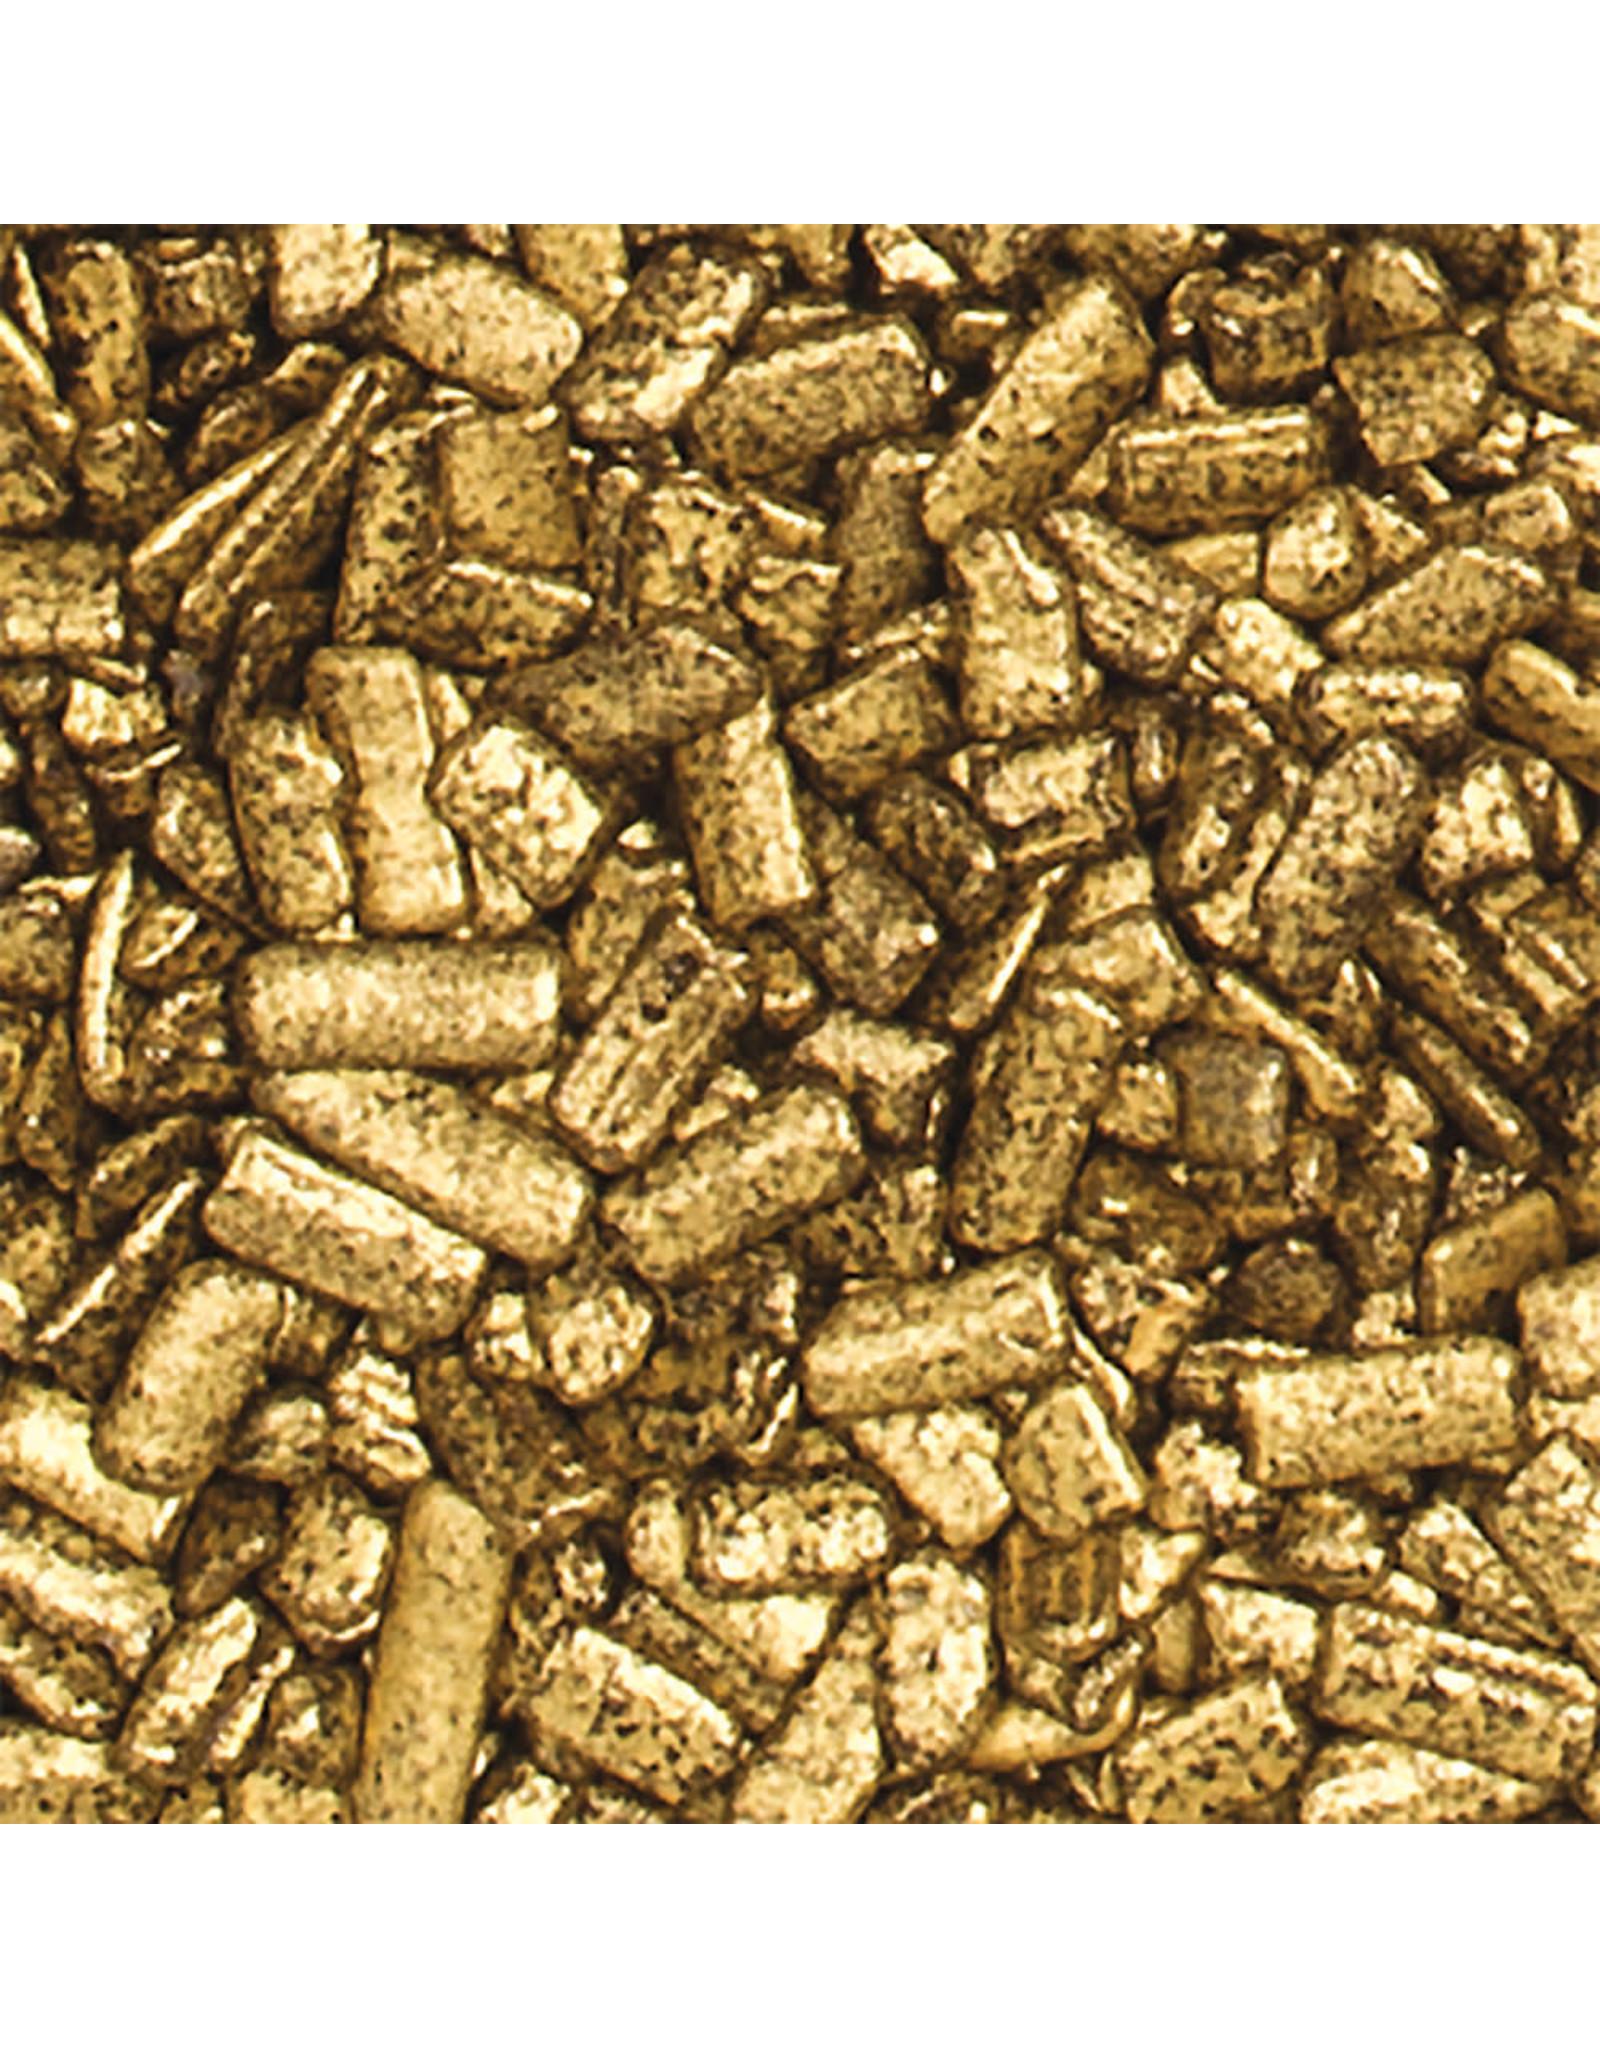 Decora Chocoladestrooisel goud 90g